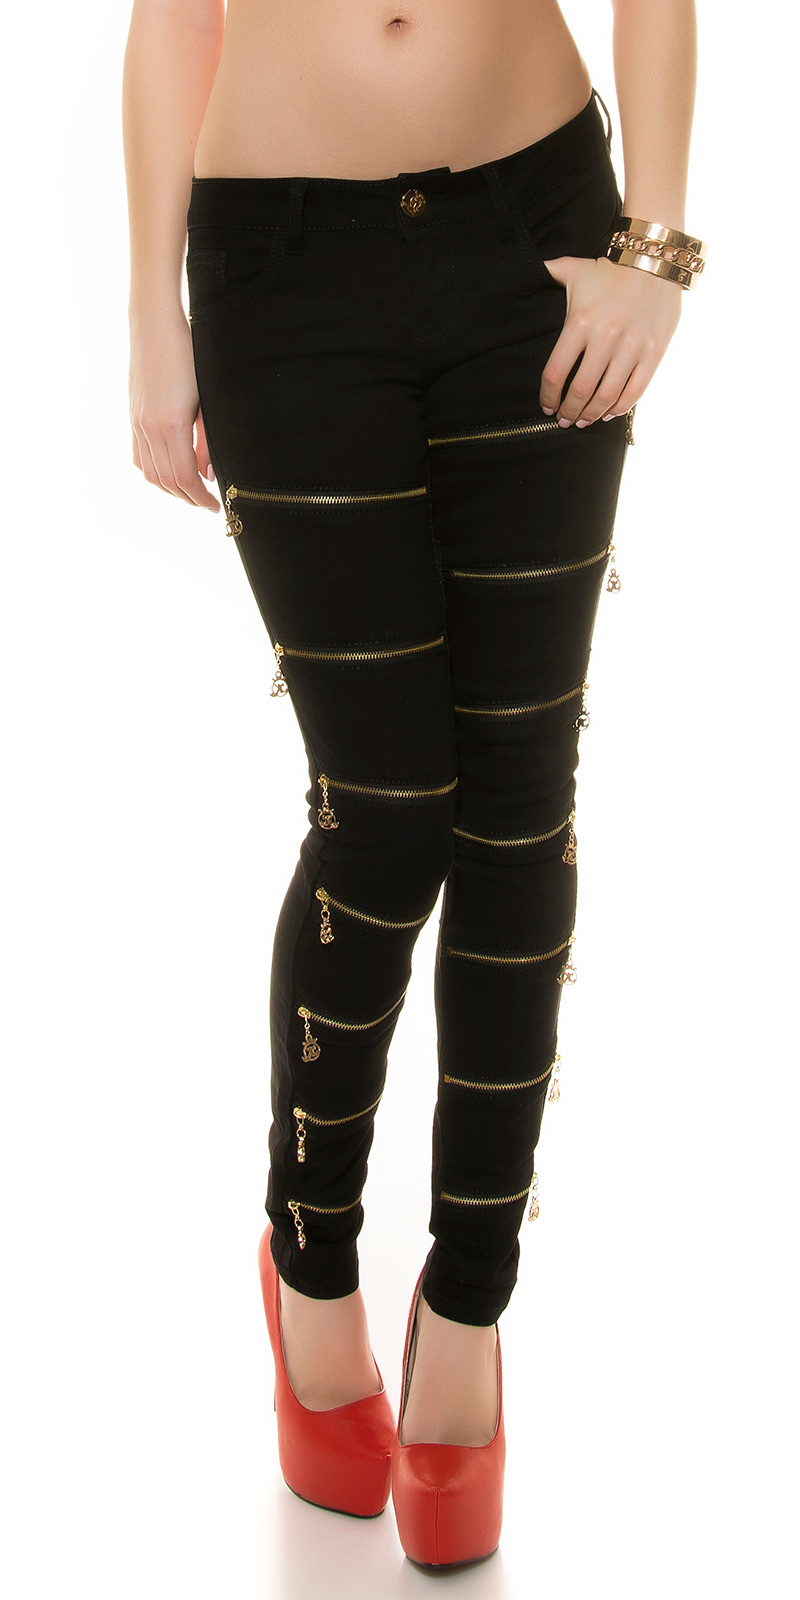 trendstylez skinny jeans mit zier zippern. Black Bedroom Furniture Sets. Home Design Ideas